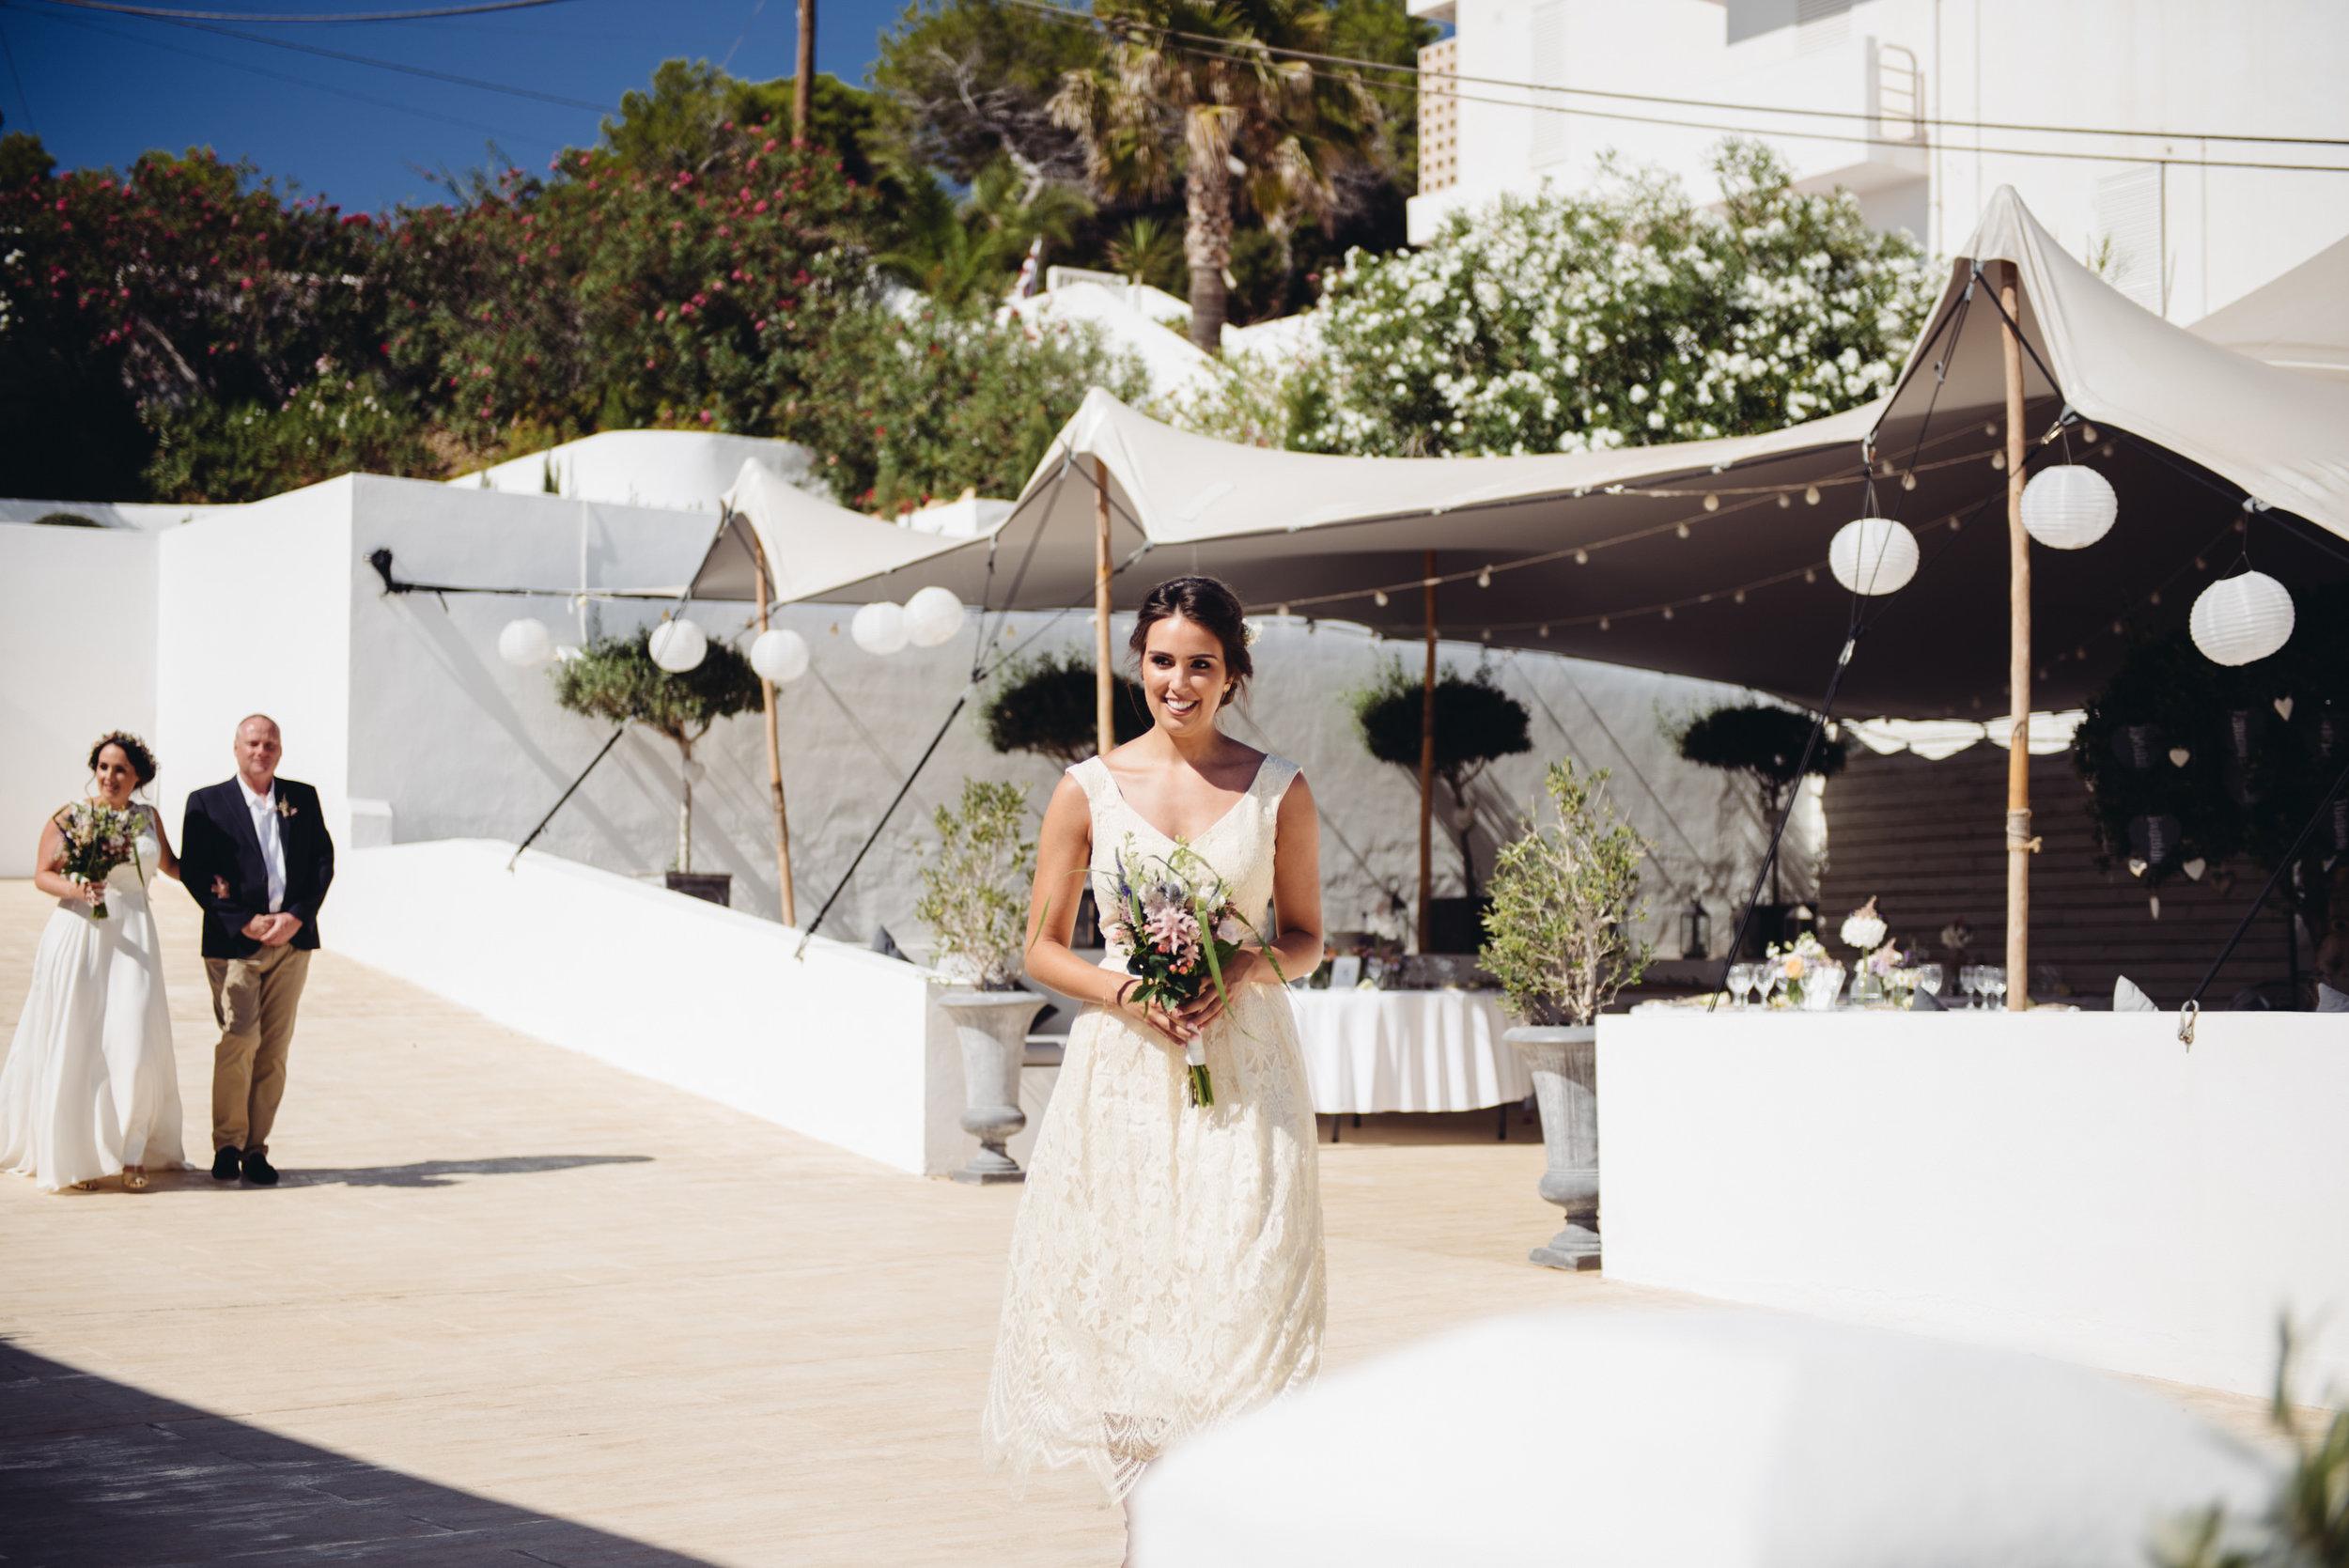 0060-IBIZA-ELIXIR-BEACH-CLUB-WEDDING-PHOTOGRAPHY-ALTERNATIVE-WEDDING-PHOTOGRAPHY.JPG